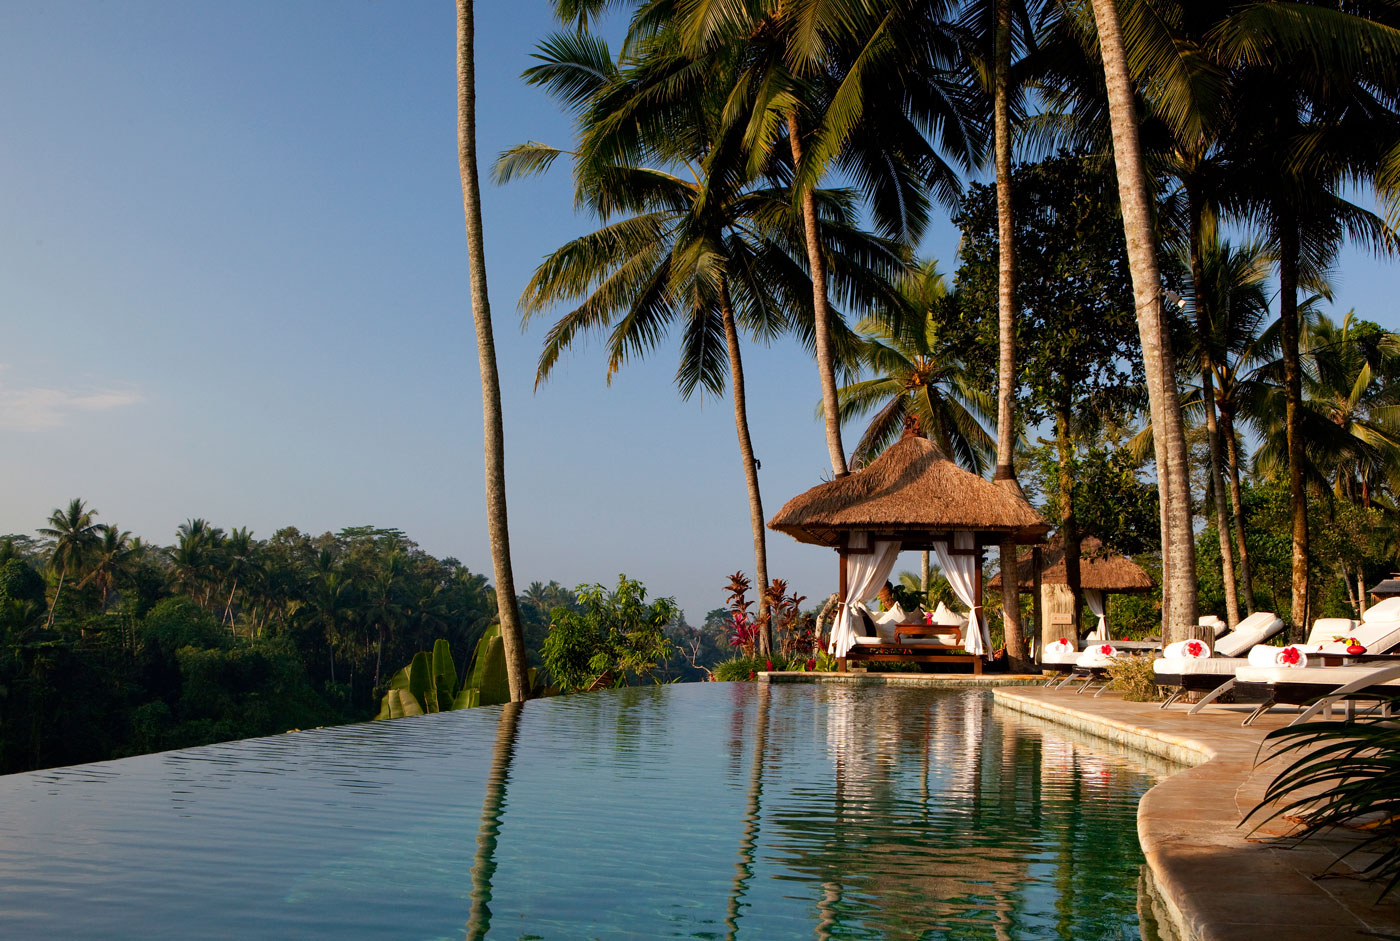 Viceroy-Bali-01